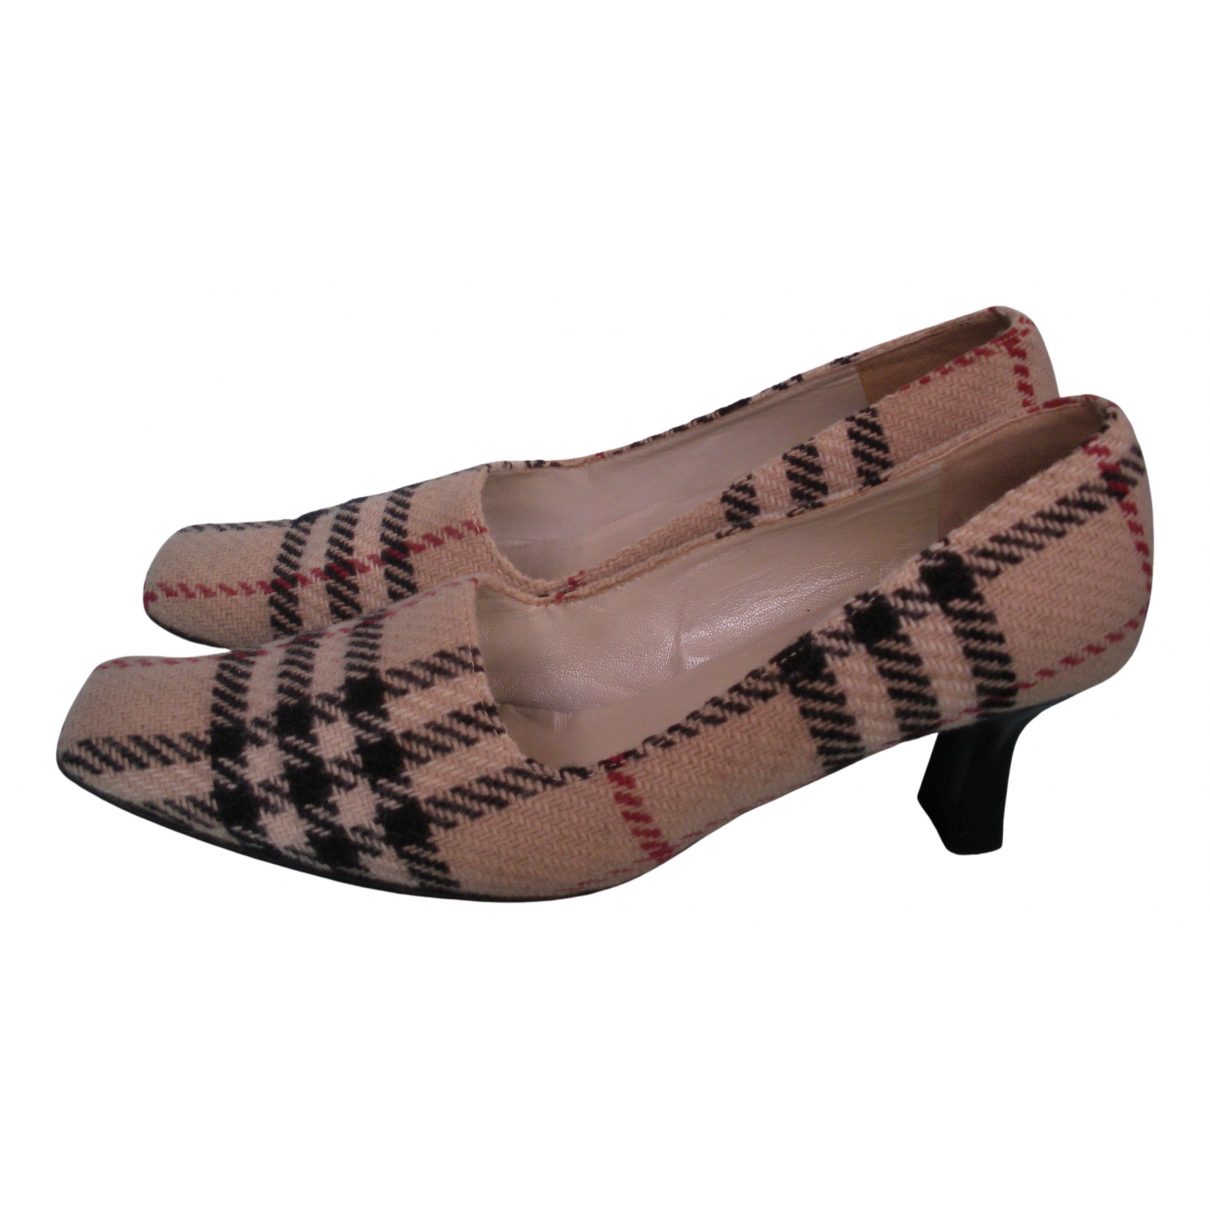 Burberry - Escarpins   pour femme en tweed - beige